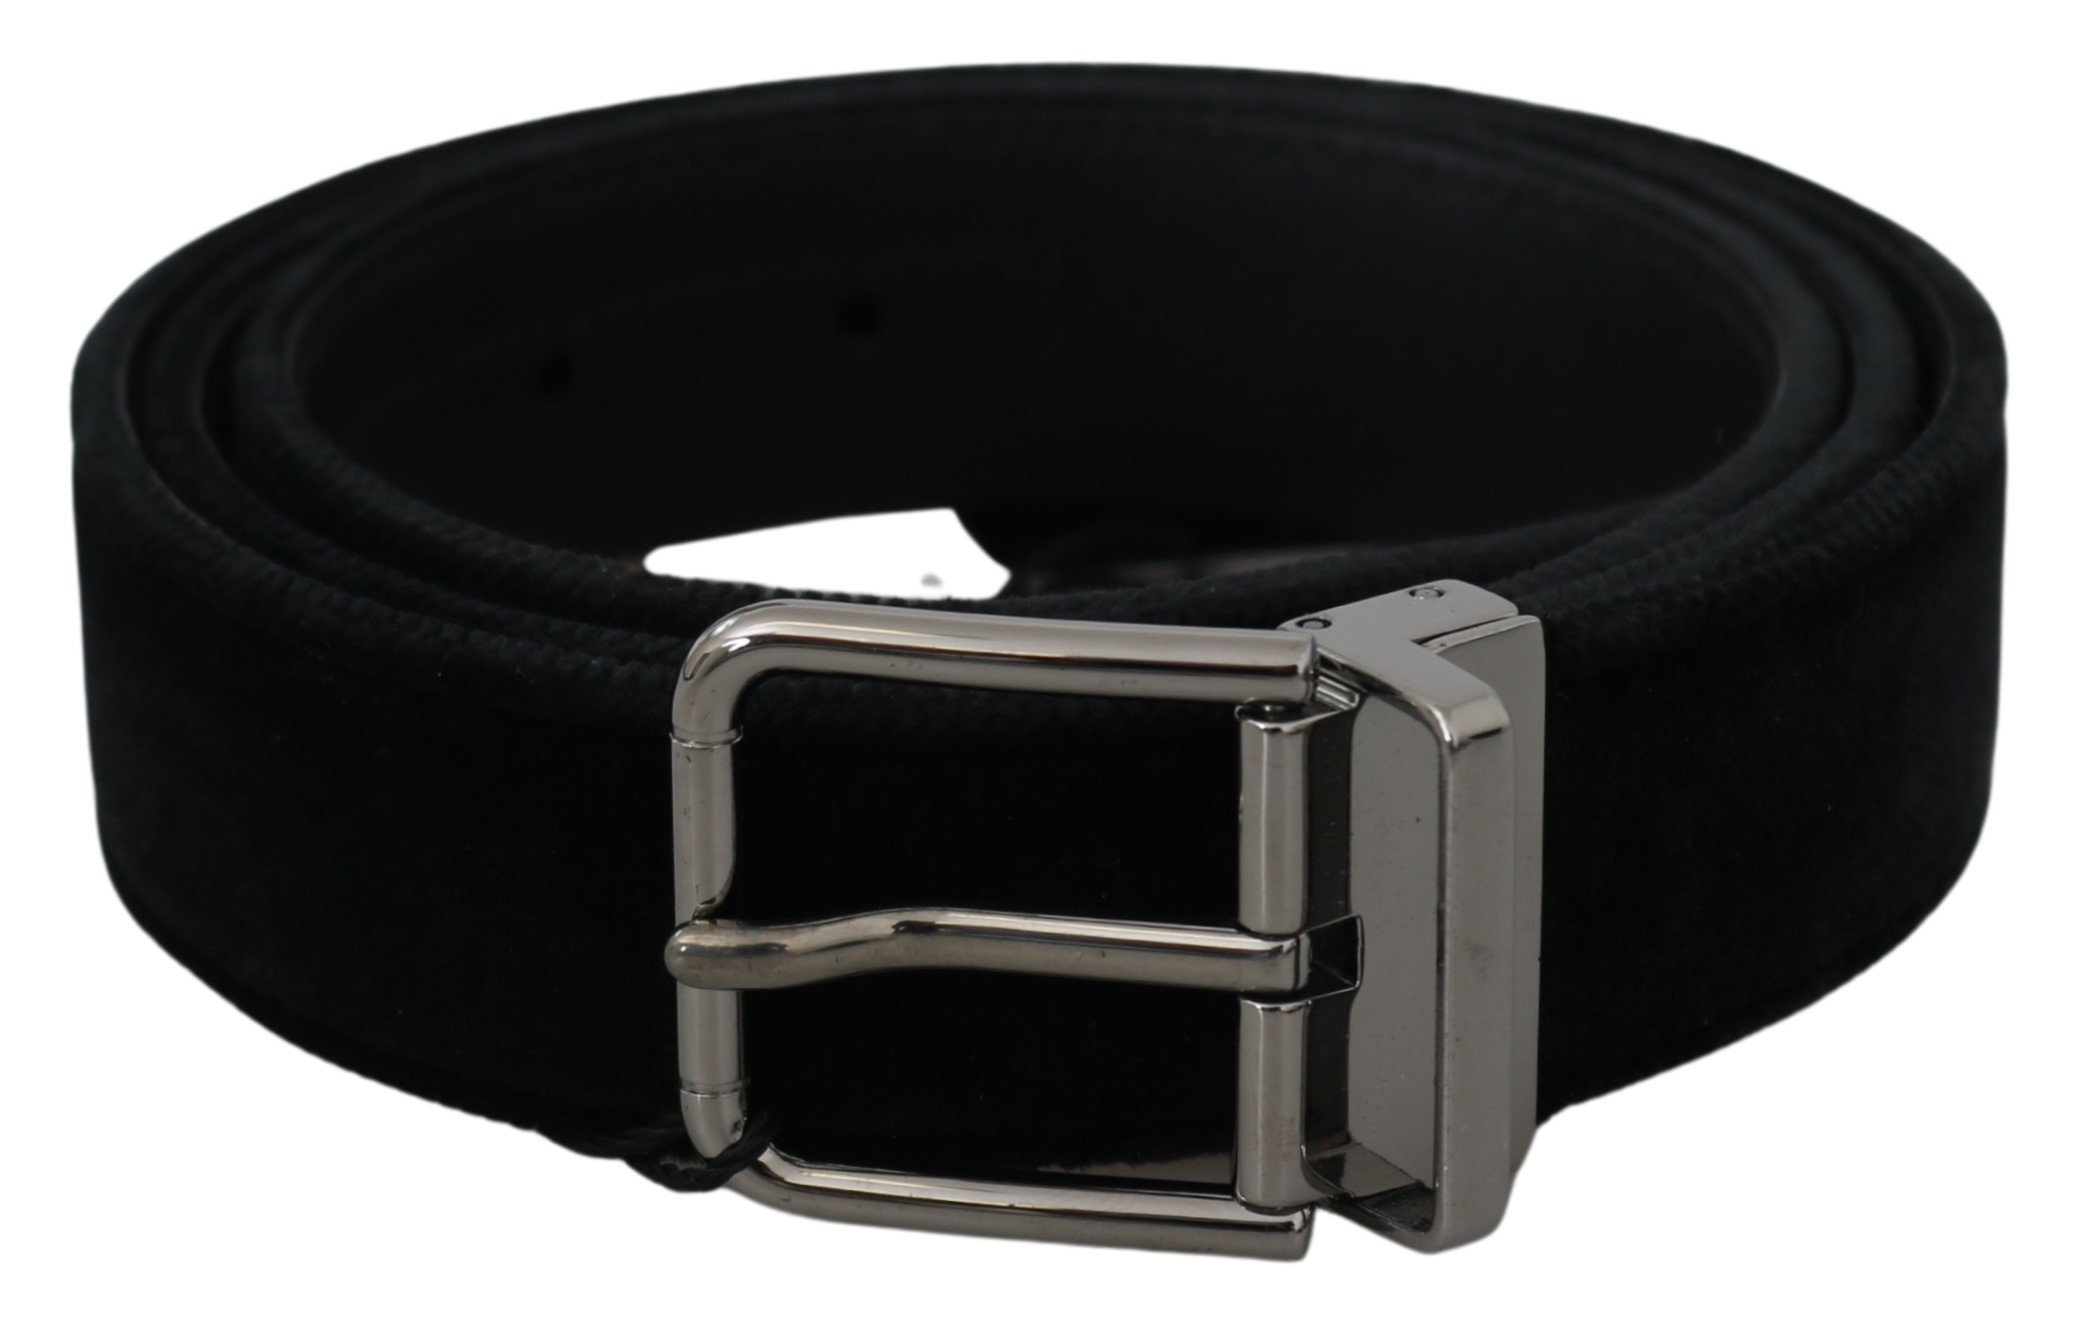 Black Velvet Leather Silver Buckle Belt - 95 cm / 38 Inches